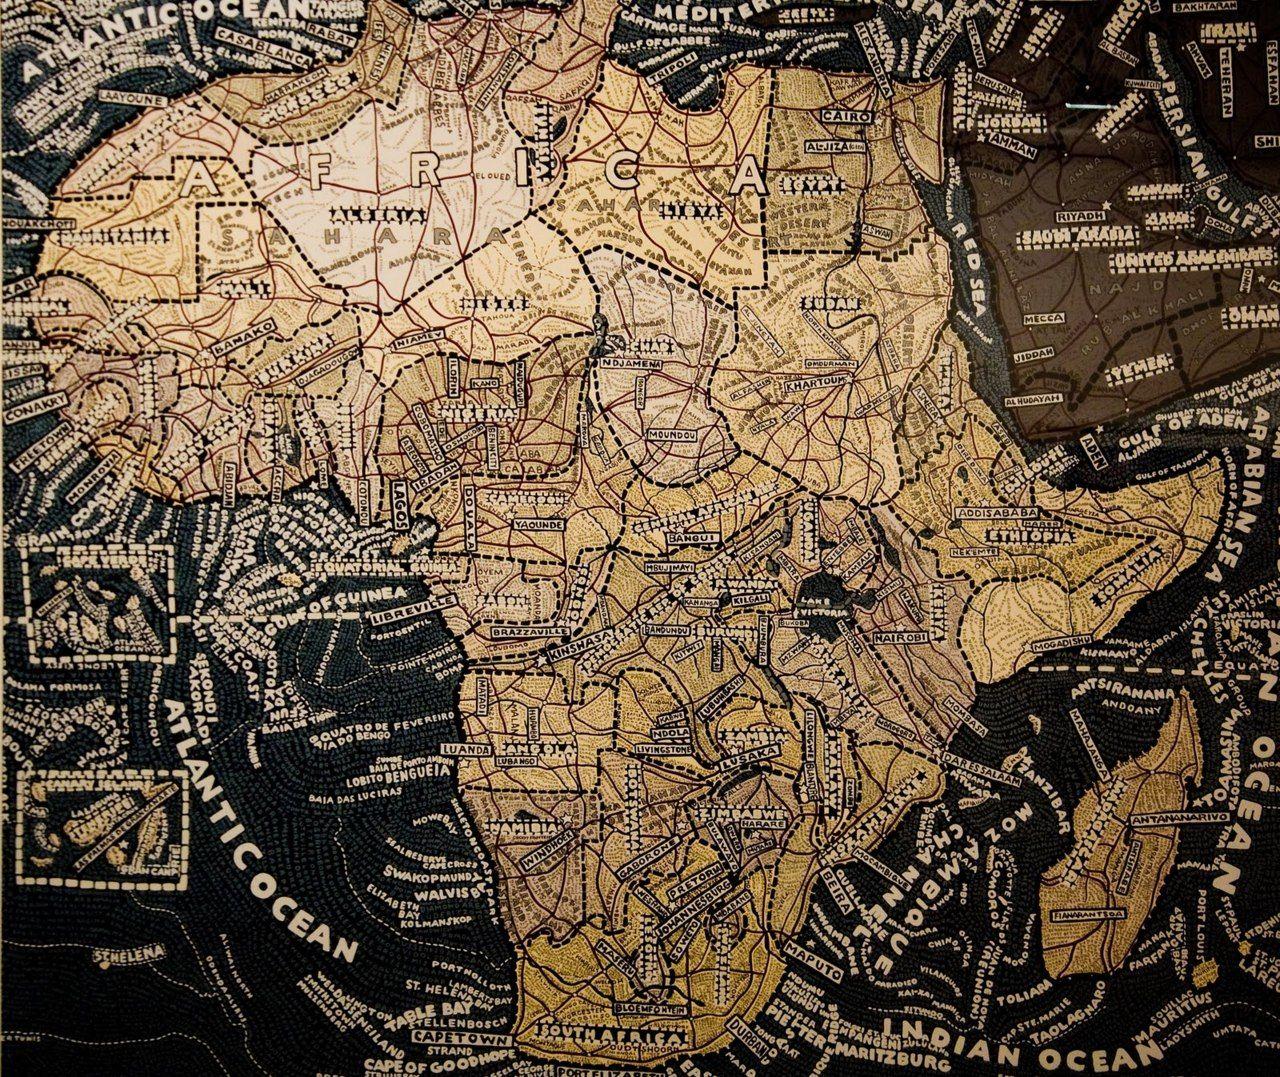 Louisiana Map Alexandria%0A Africa       Paula Scher creates intricate typographic maps  beartsy blogspot com